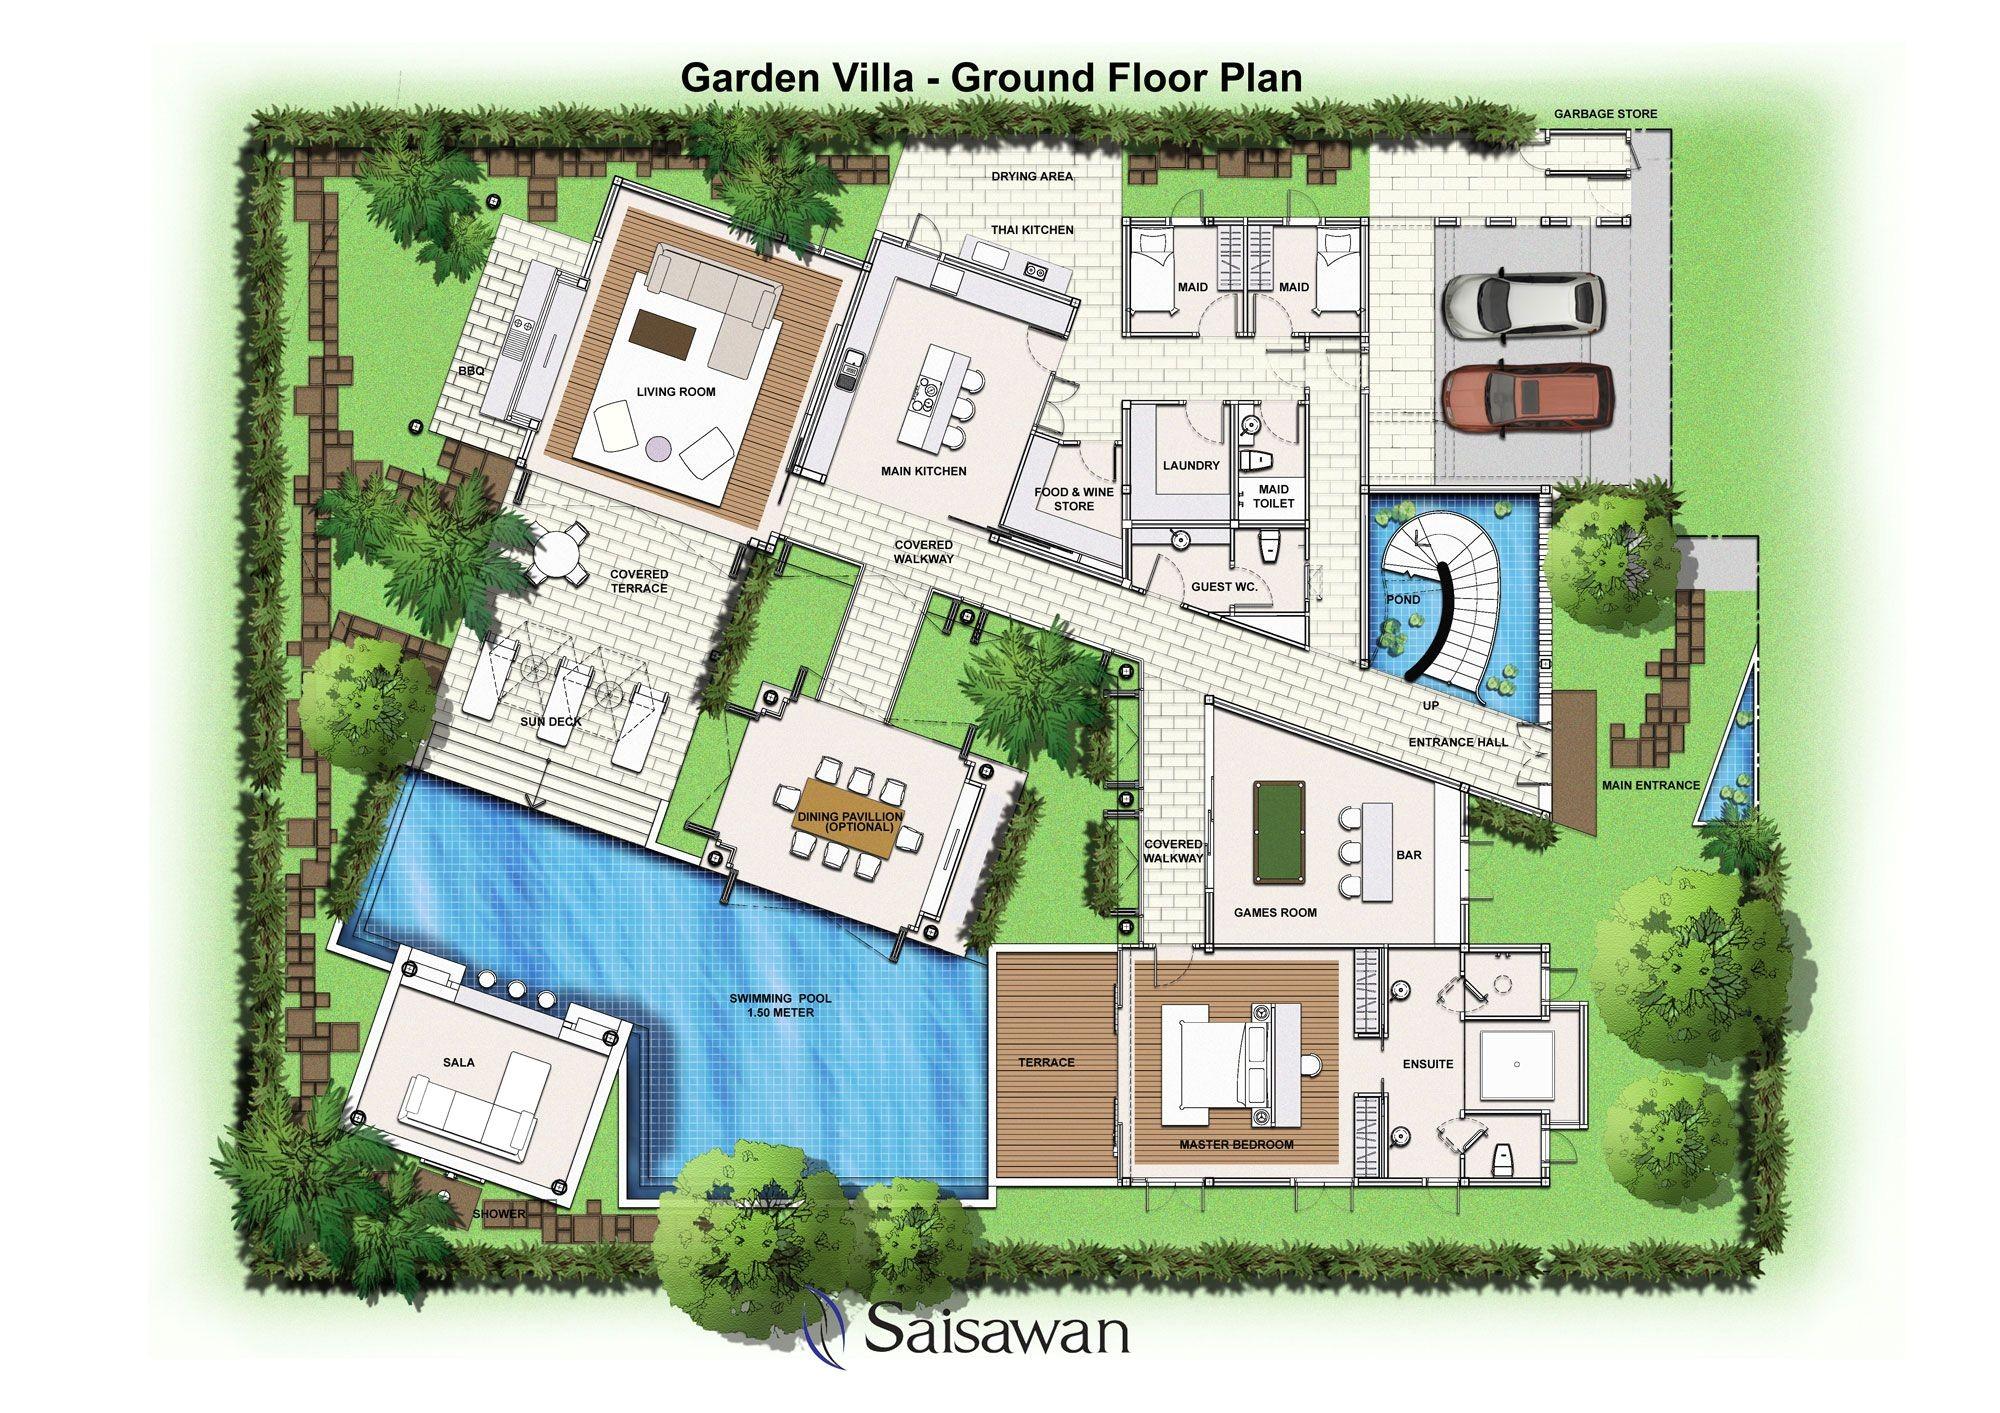 Garden Home Plans Saisawan Garden Villas Ground Floor Plan House Plans